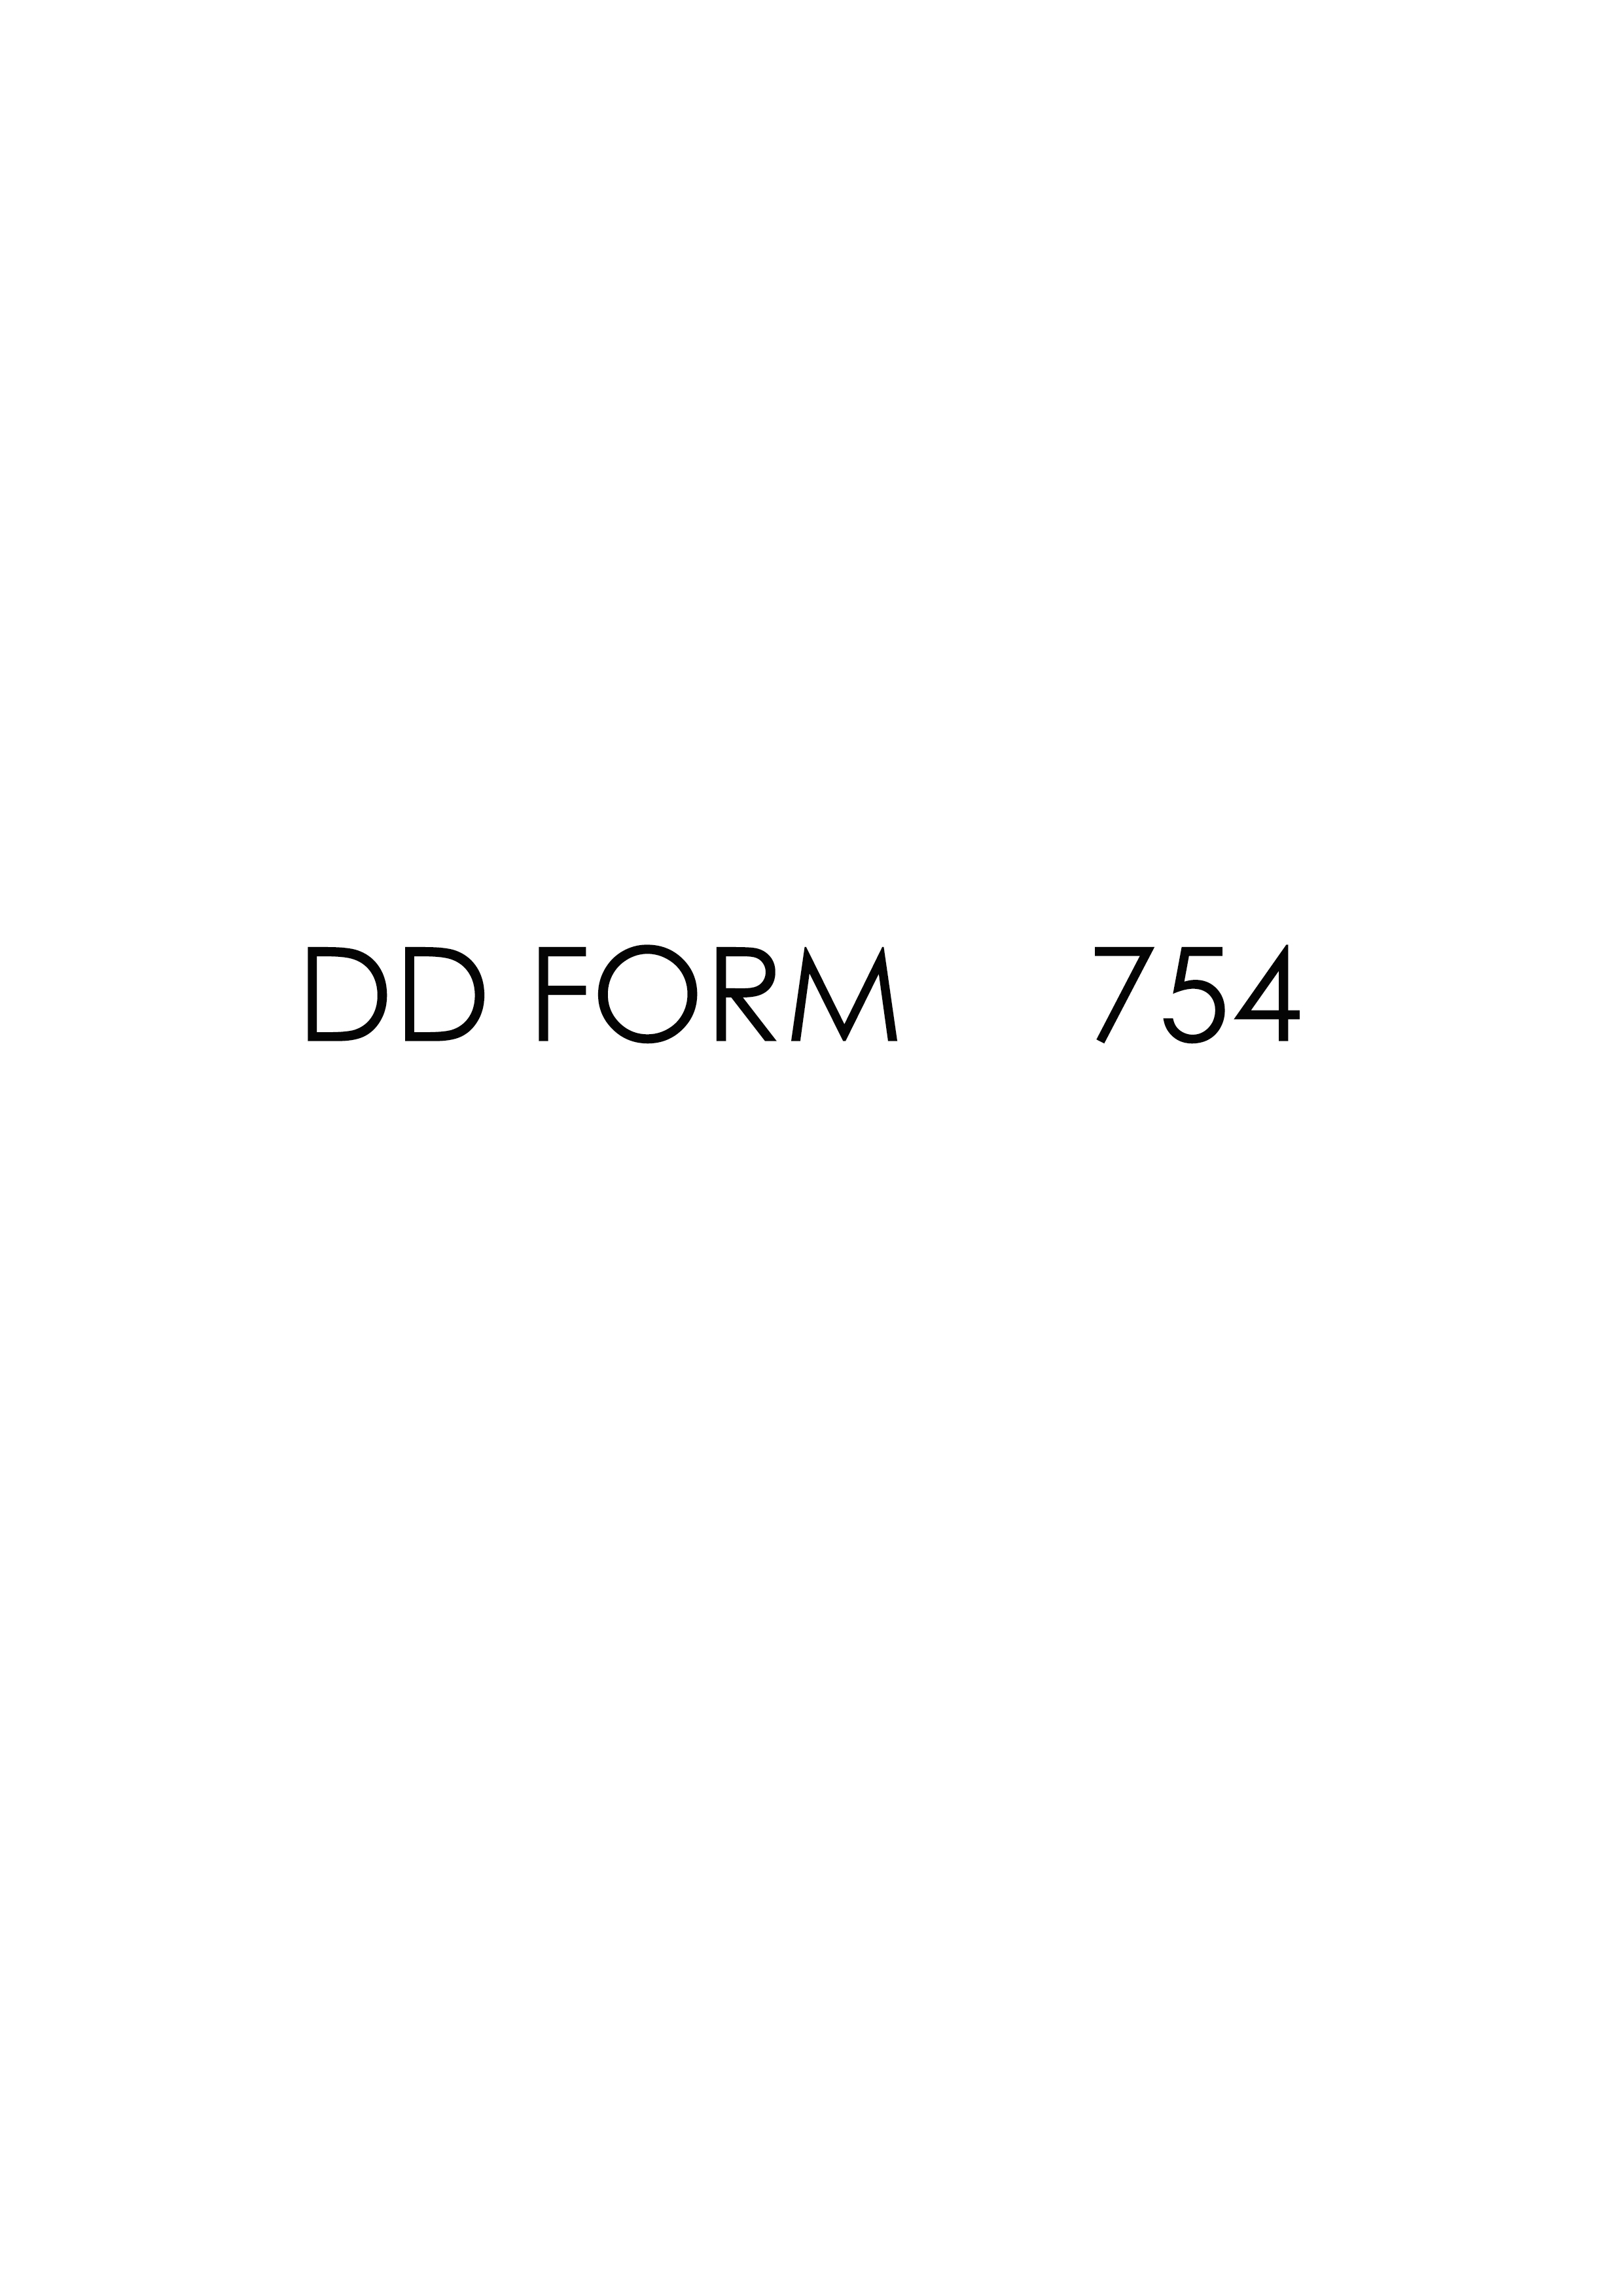 Download dd Form 754 Free